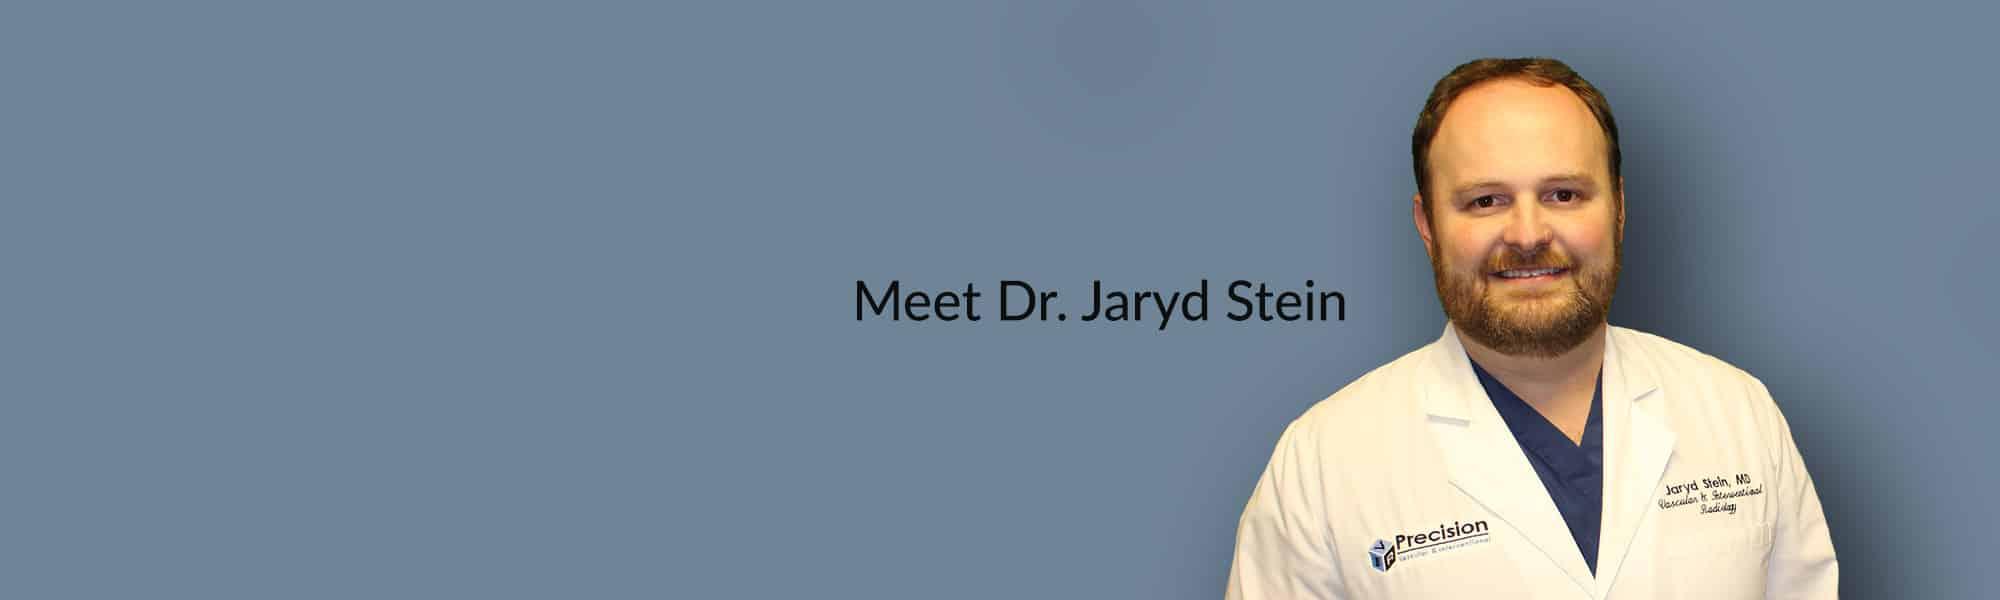 Precision-Doctors-Slider-Home_J.Stein